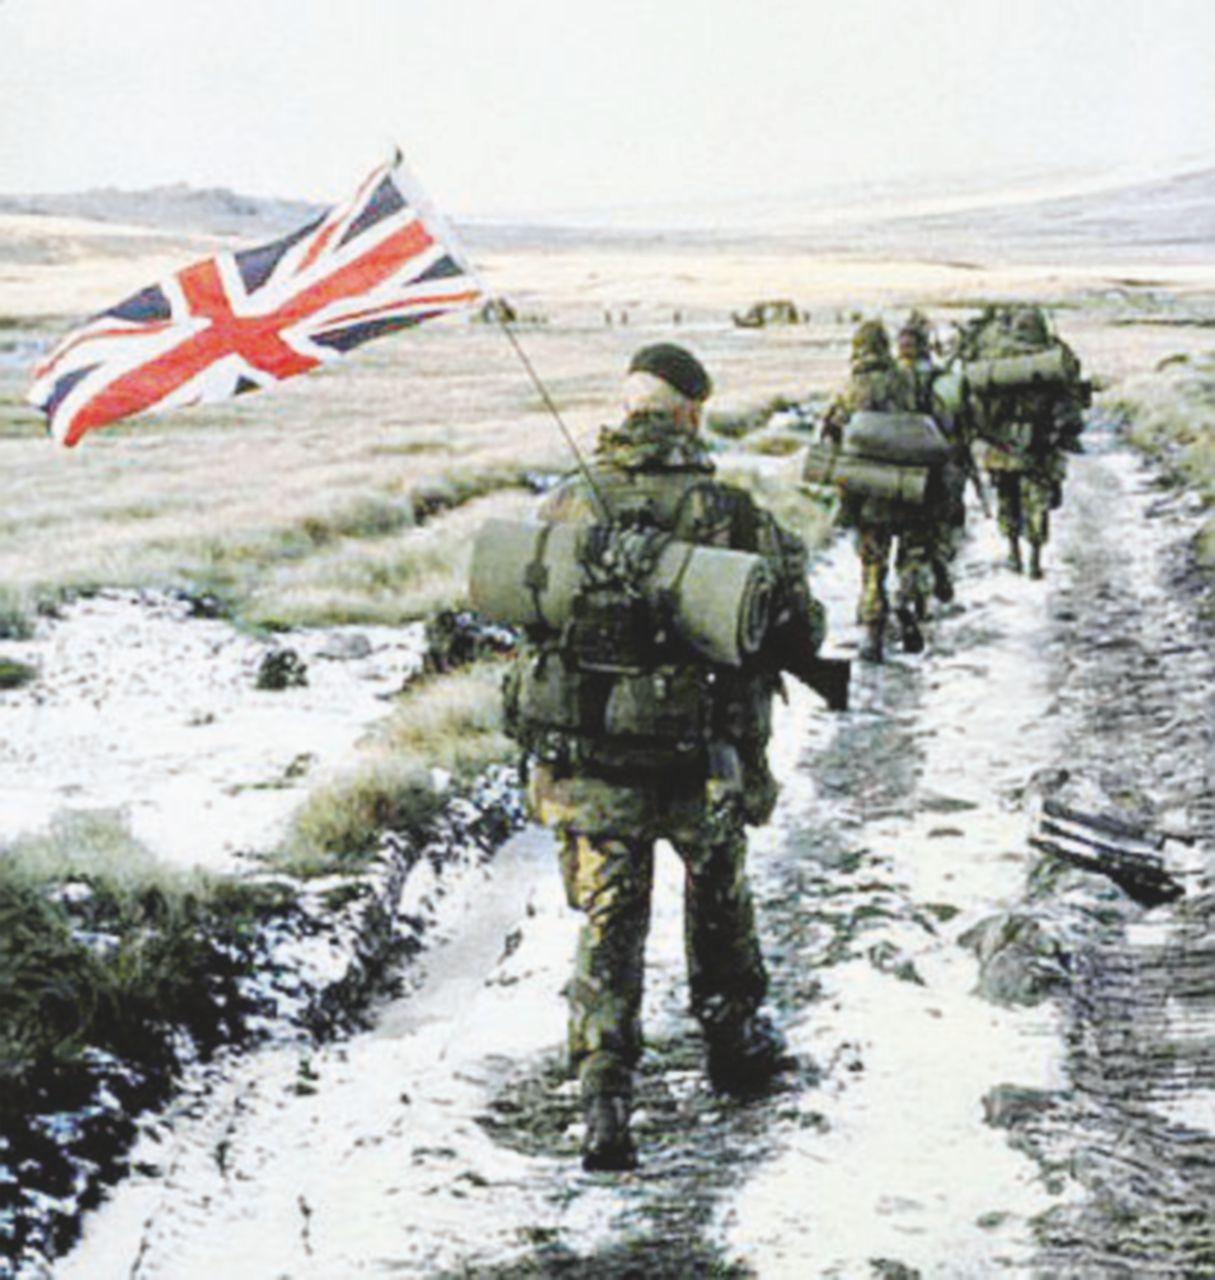 Contrordine gentlemen, le Falkland ridiventano Malvinas, terra d'Argentina